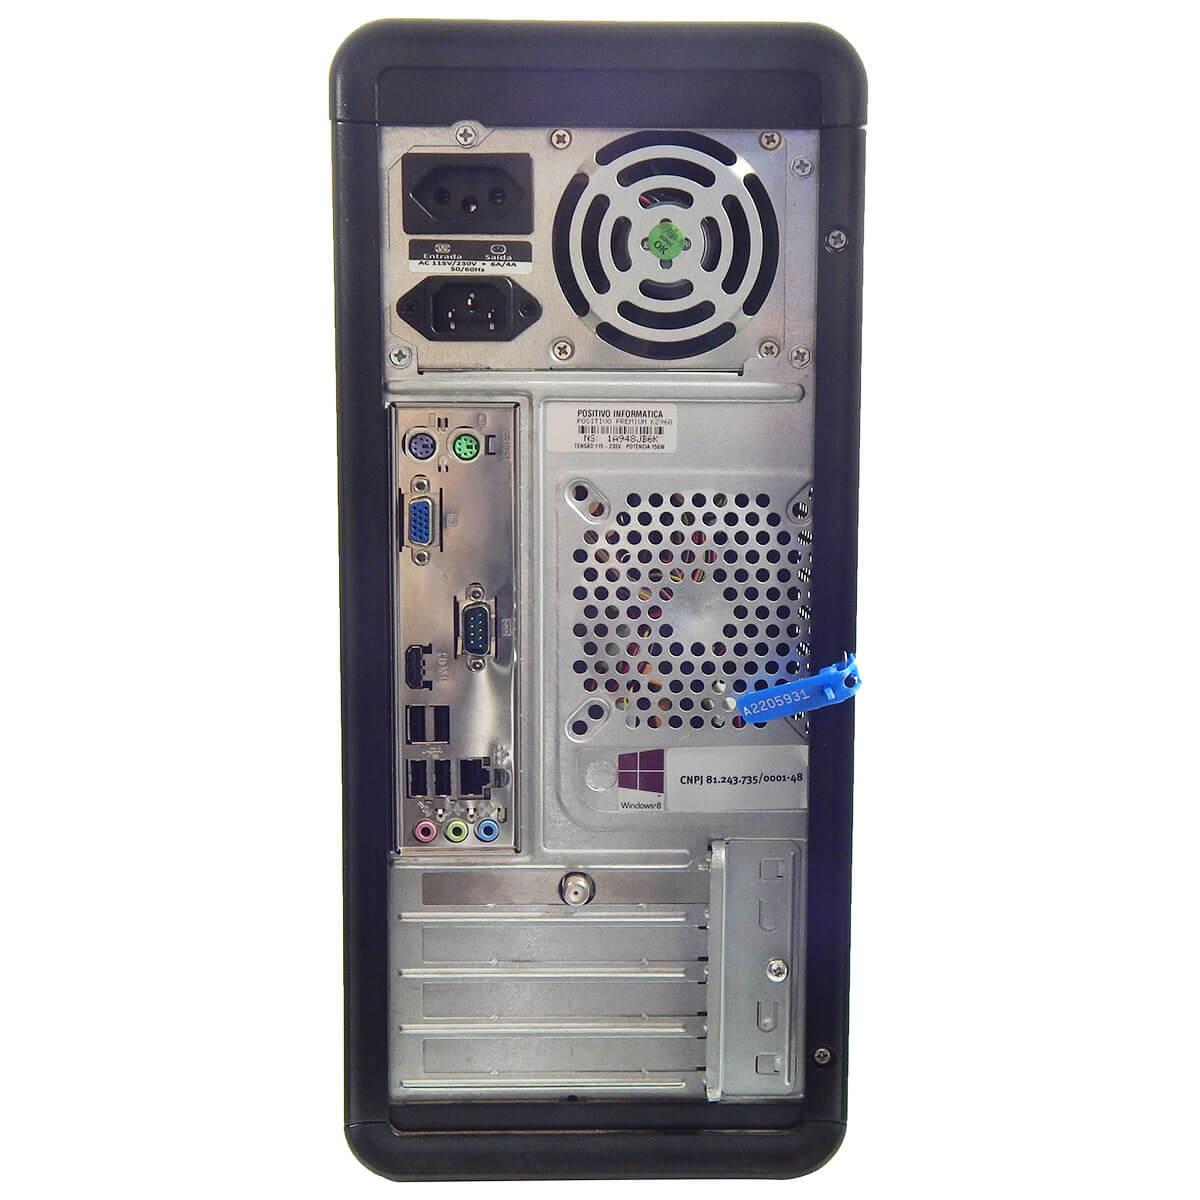 PC Positivo Premium PCTV K3210 CEL. 847/4G/320 - 1020311